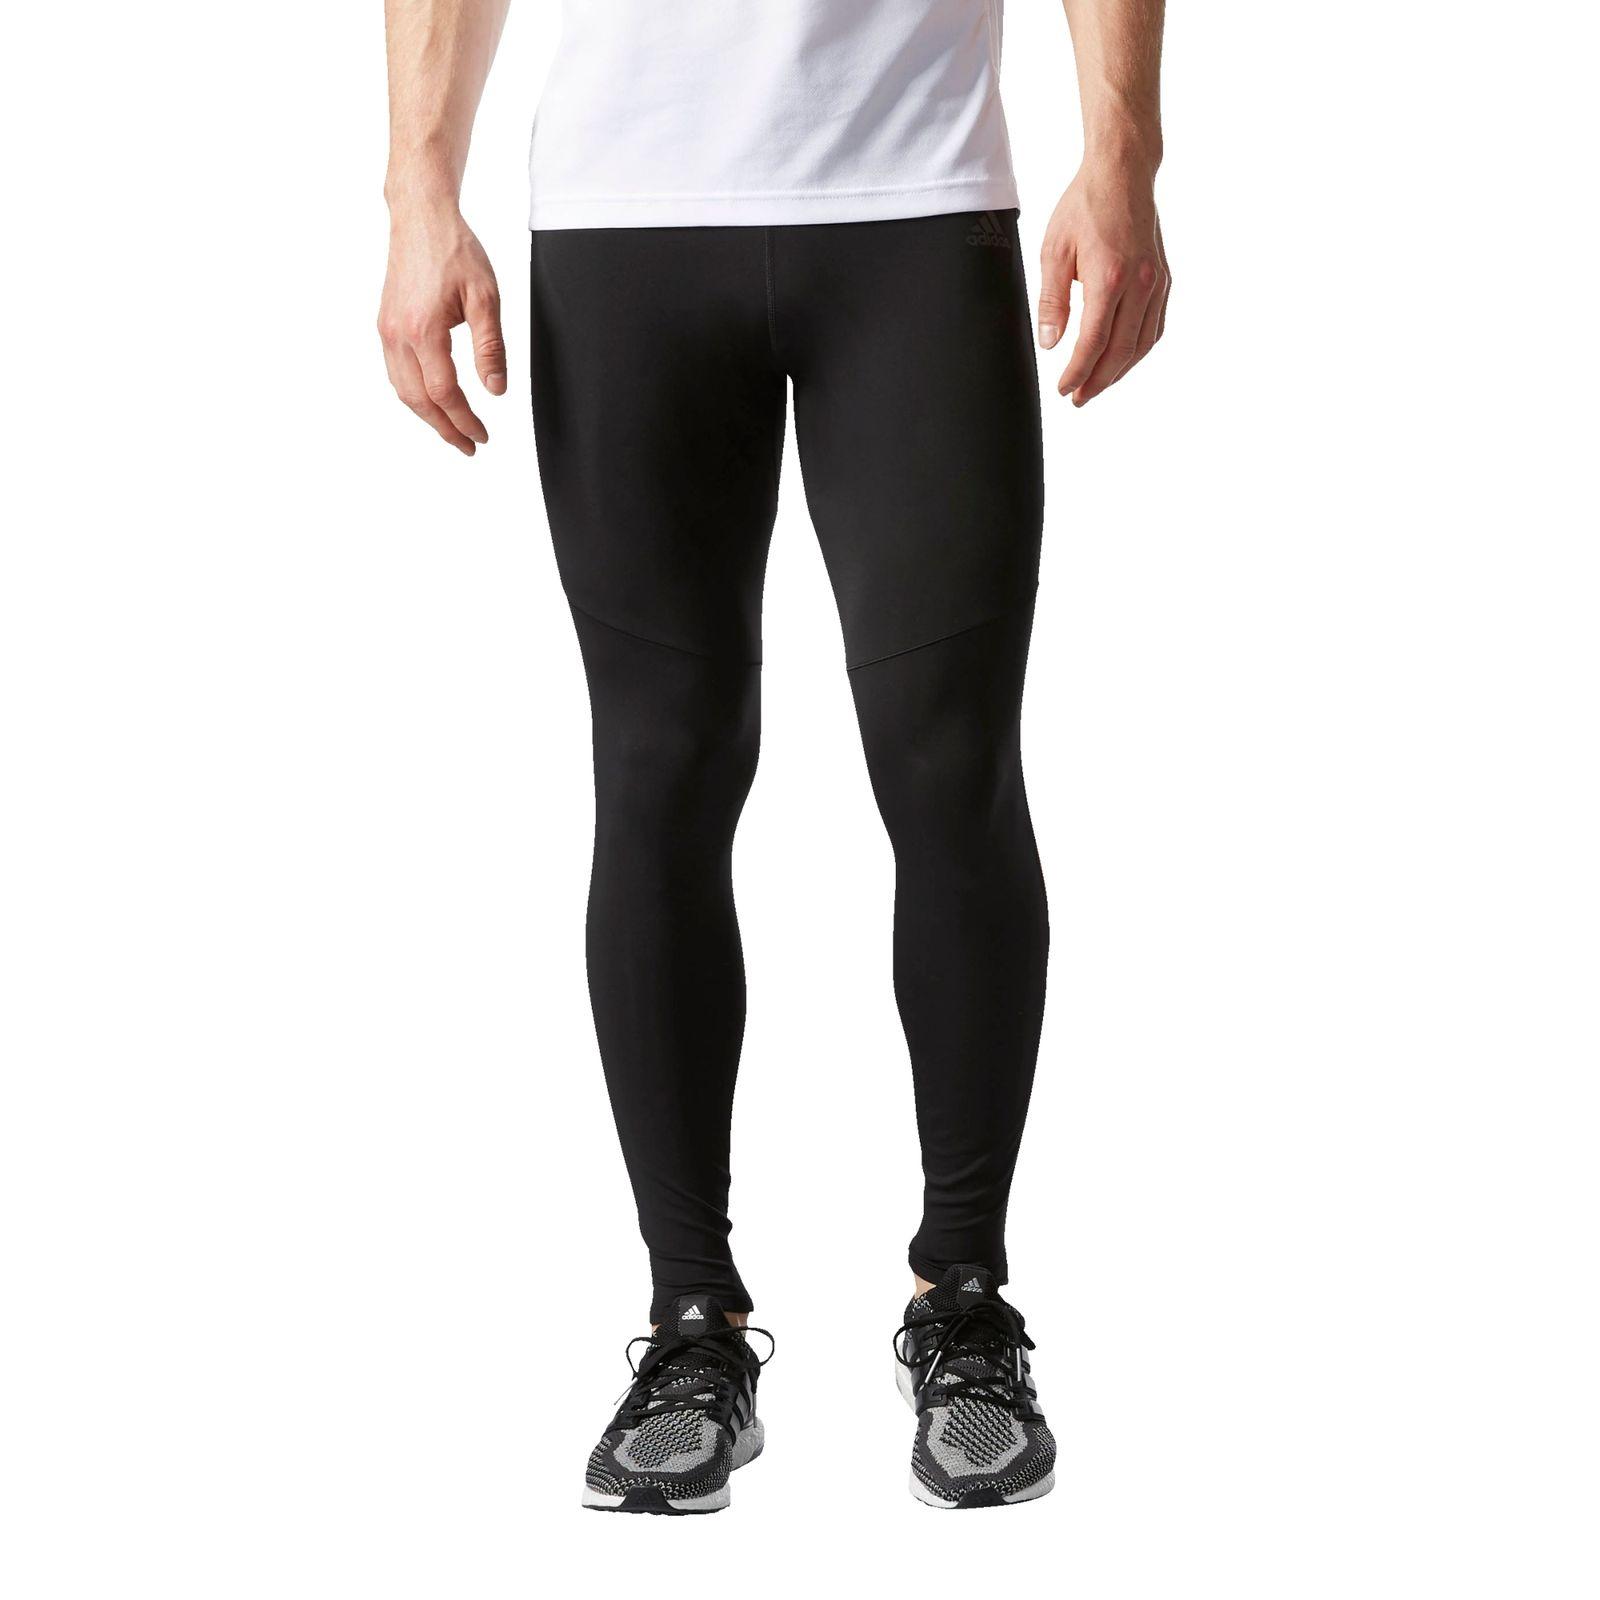 adidas Performance Herren Laufhose Response 34 Tight Sporthose Black Men Hosen Funktionshose